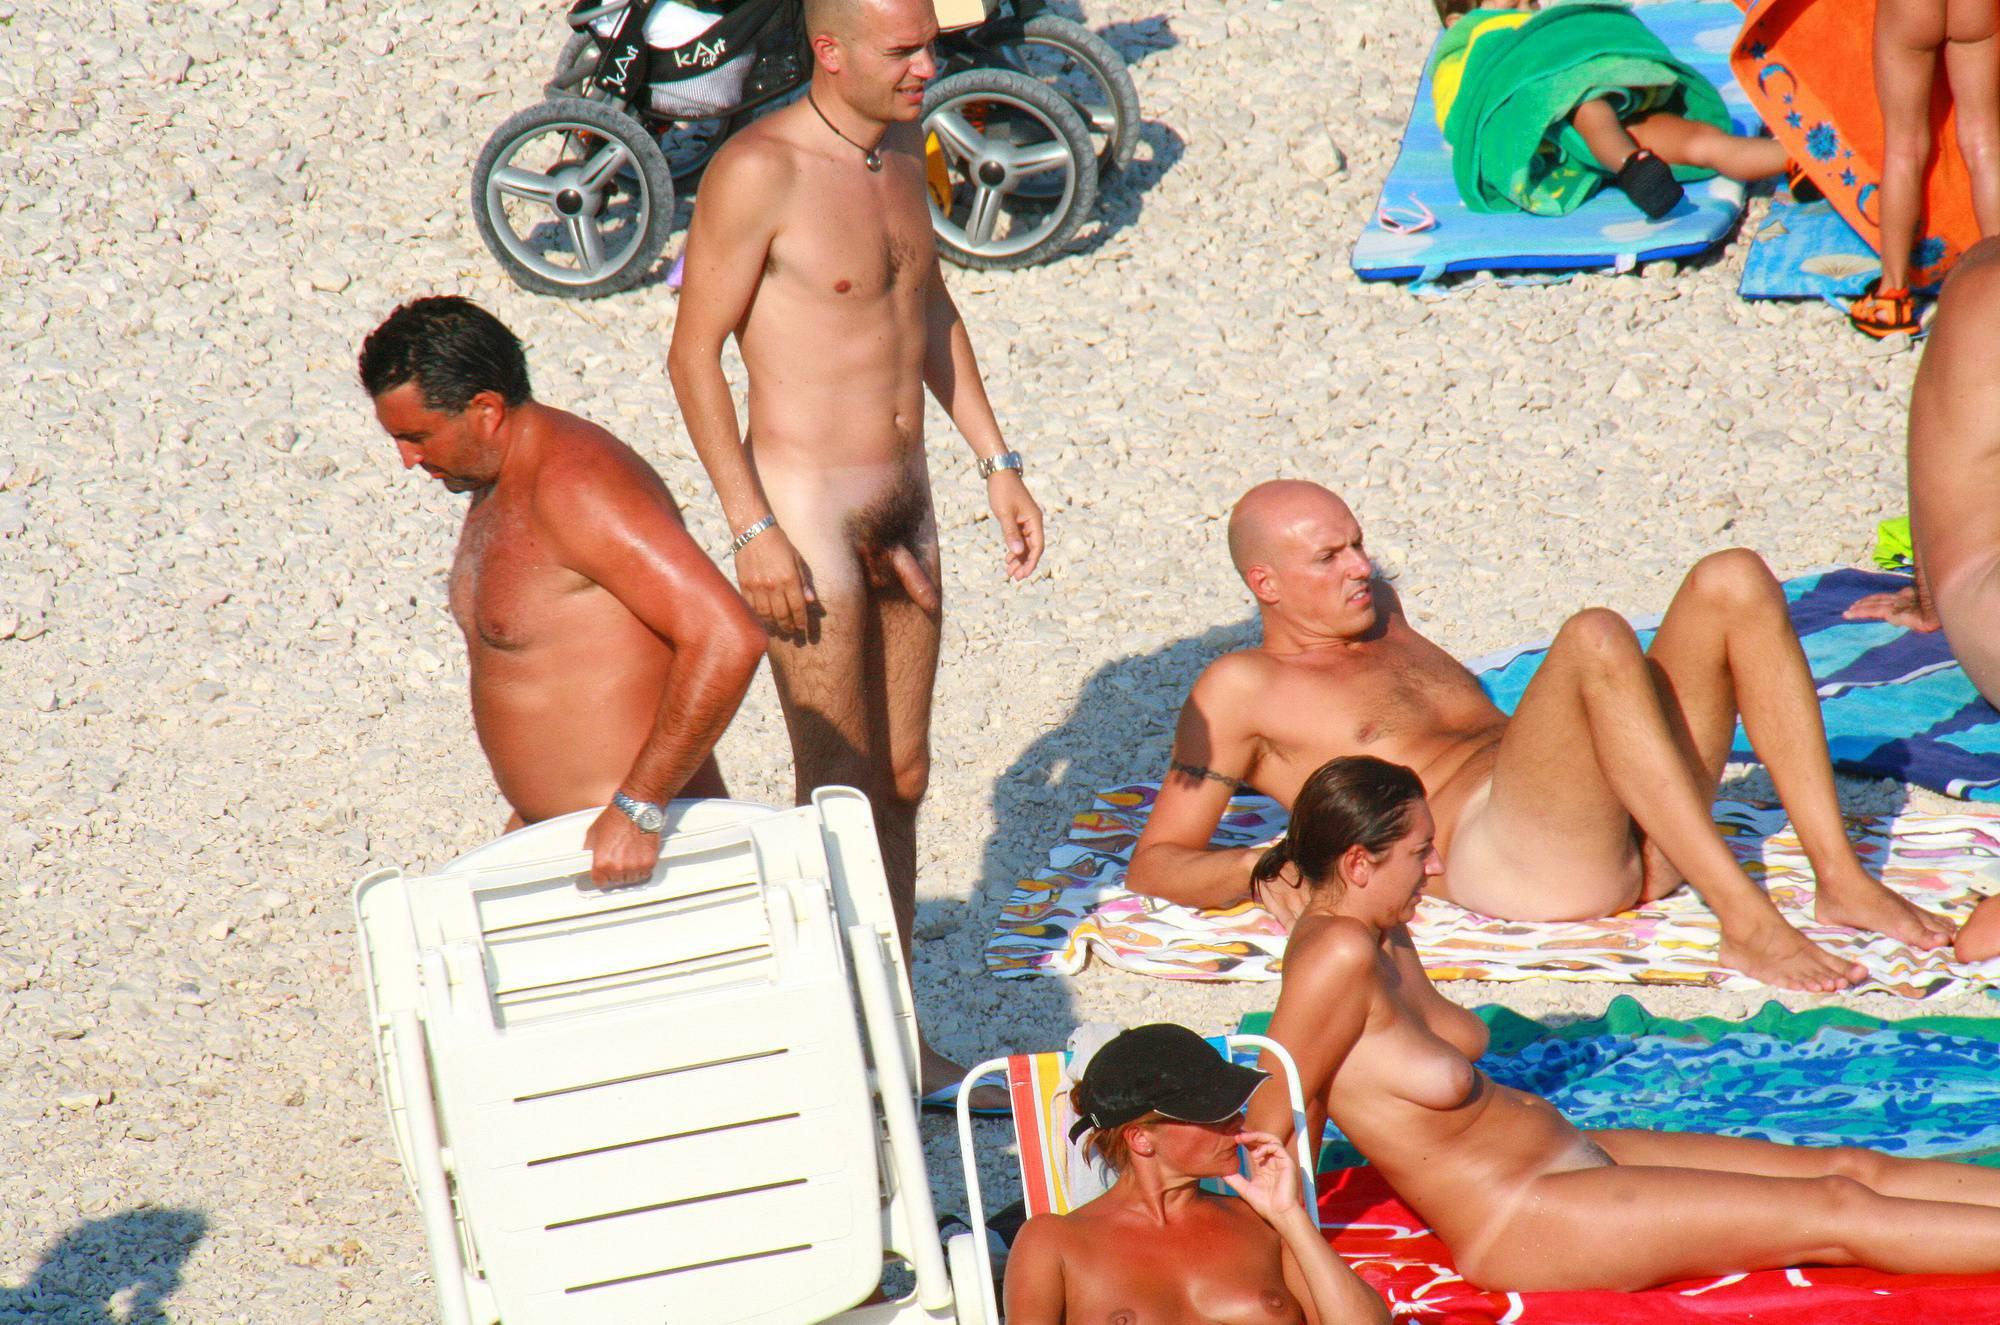 Nudist Photos Ula FKK Beach Friends - 2